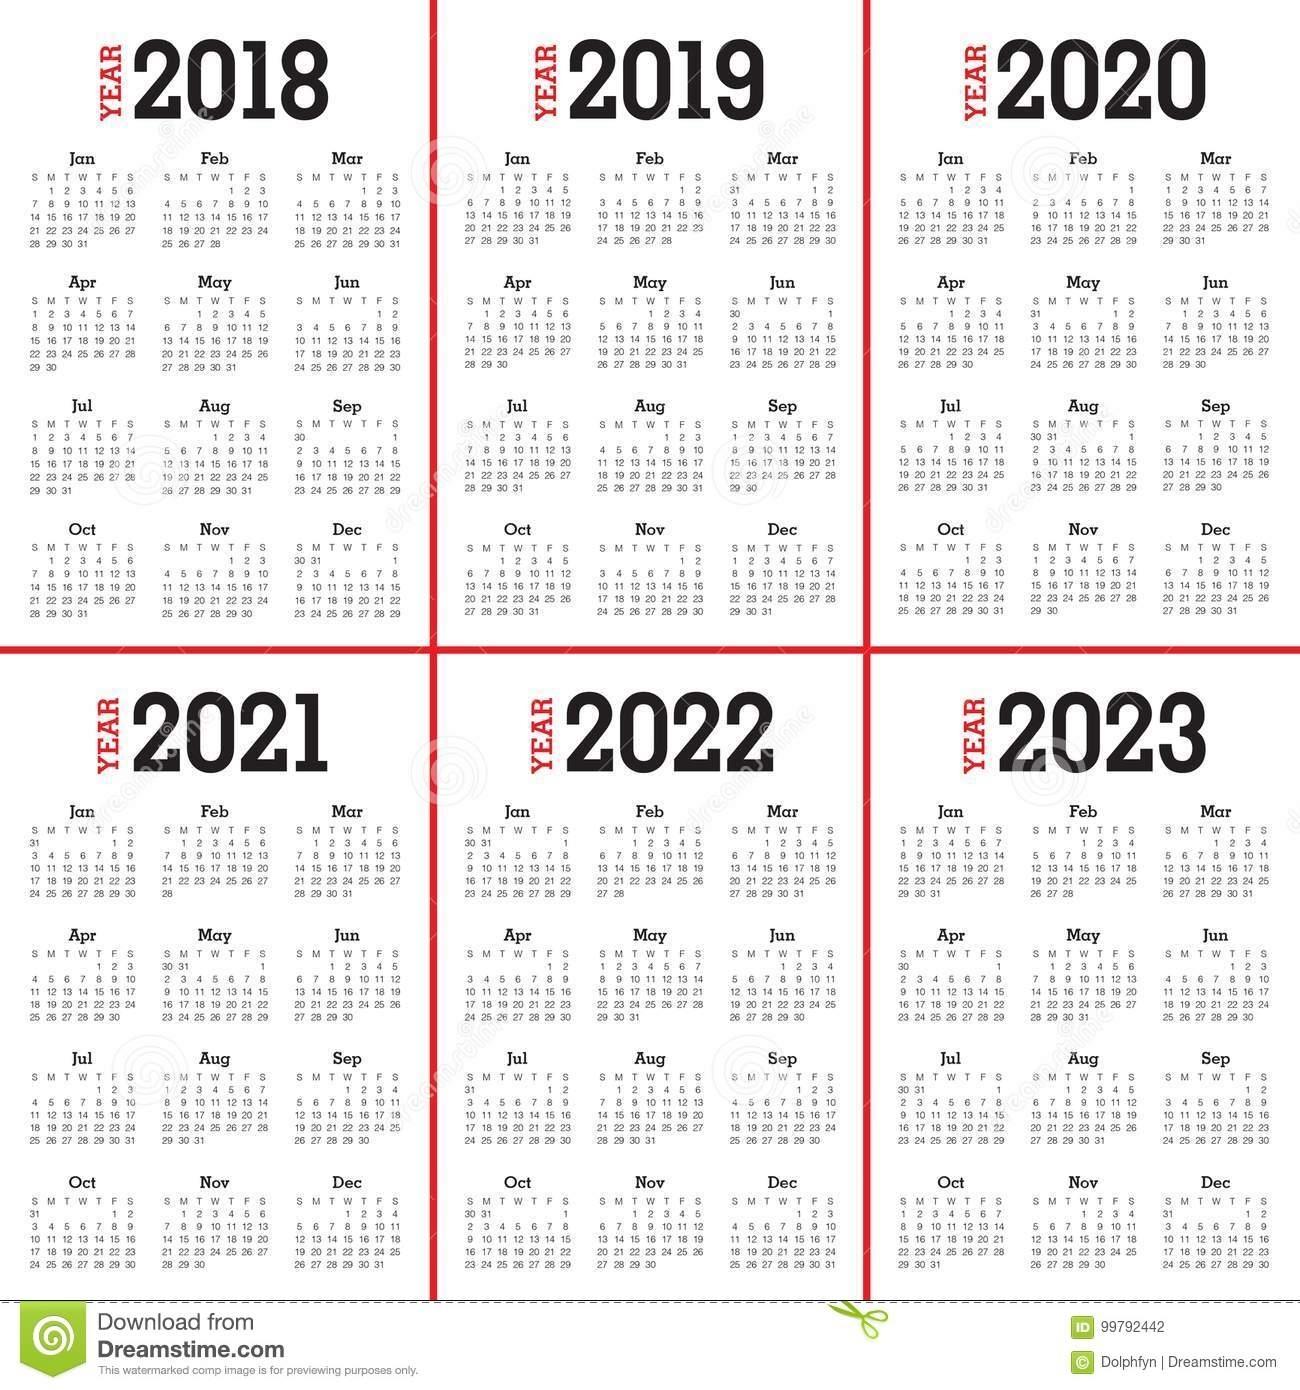 Year 2018 2019 2020 2021 2022 2023 Calendar Vector Stock Vector inside U Of L 2019/2020 Calendar